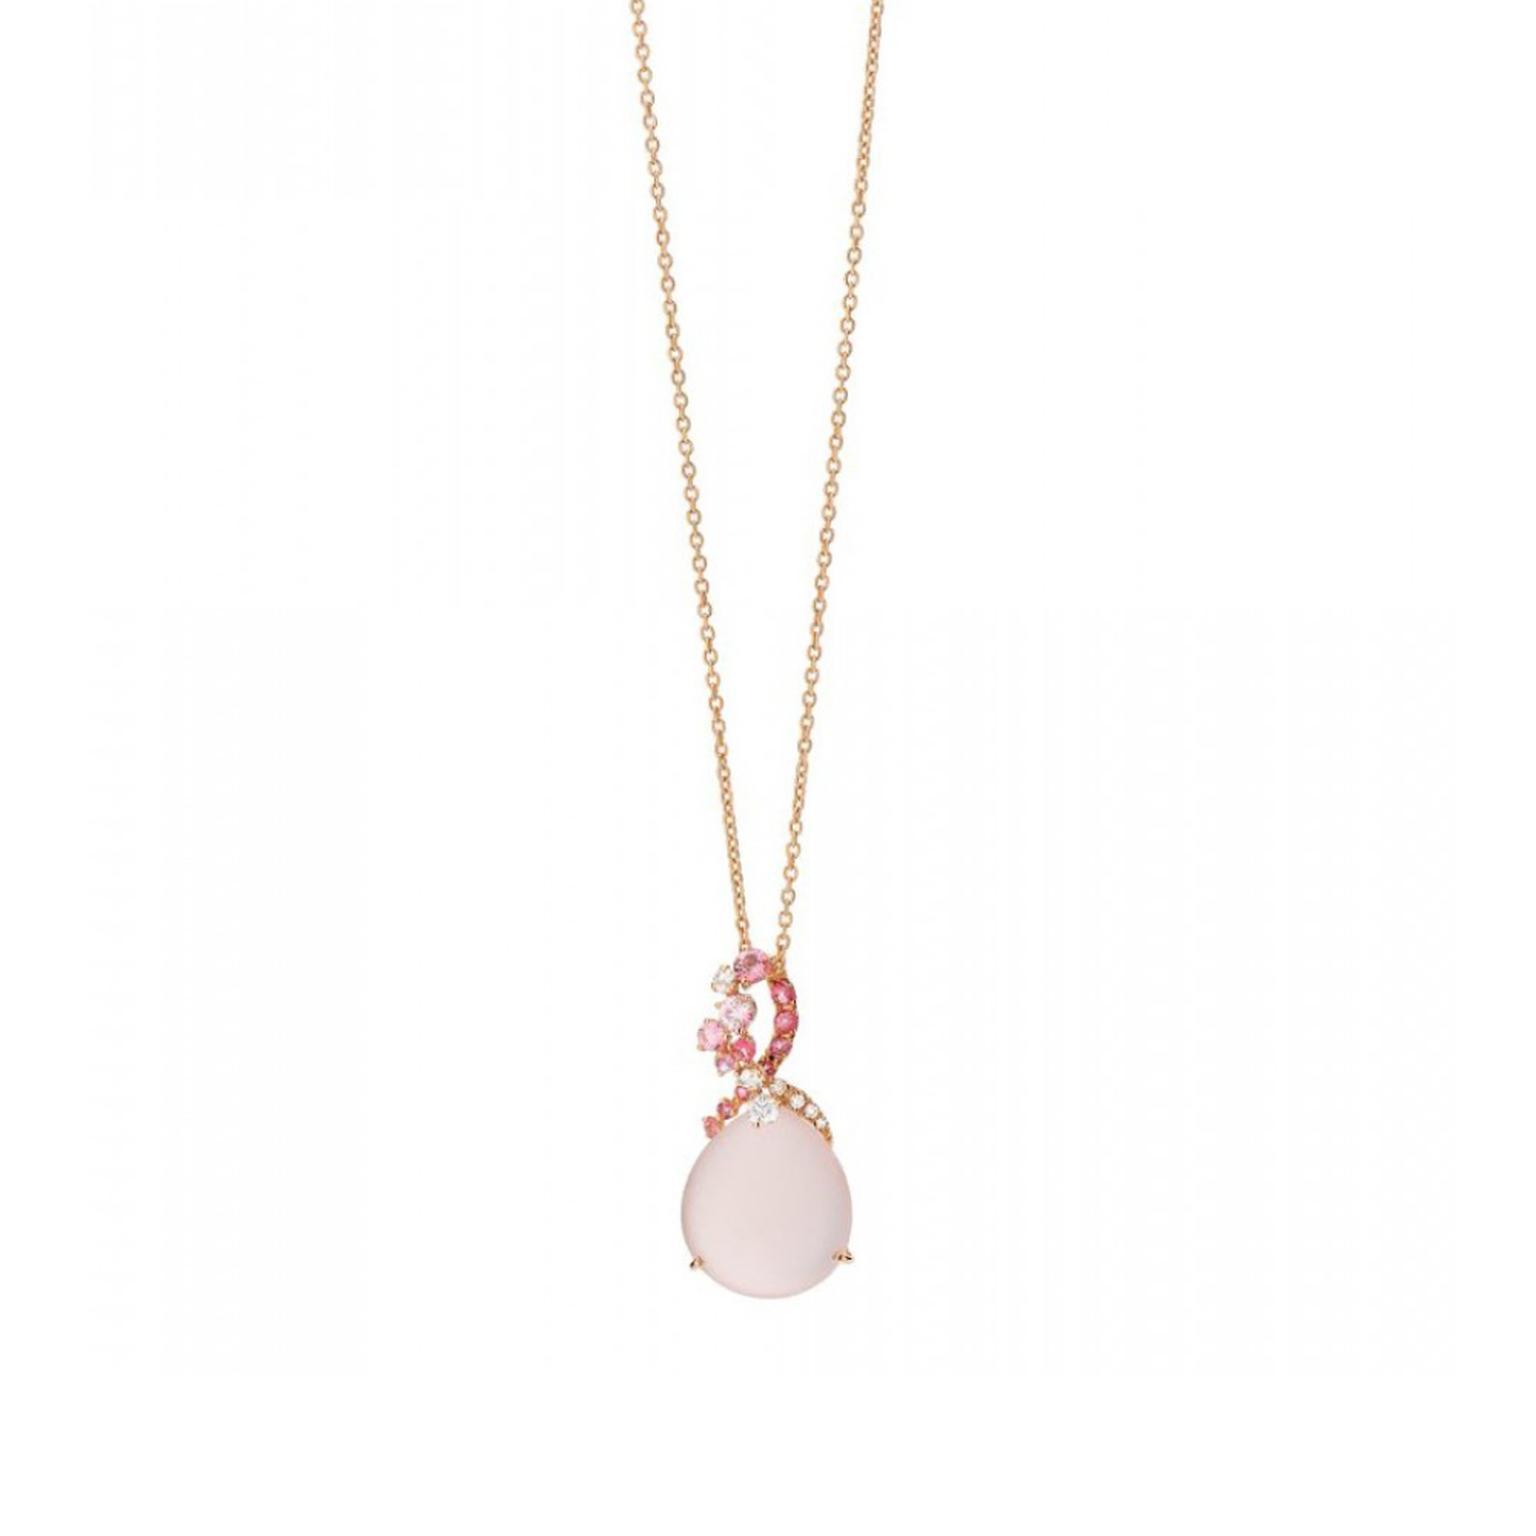 Favorite Baobab rose quartz pendant necklace | Brumani | The Jewellery Editor OE11